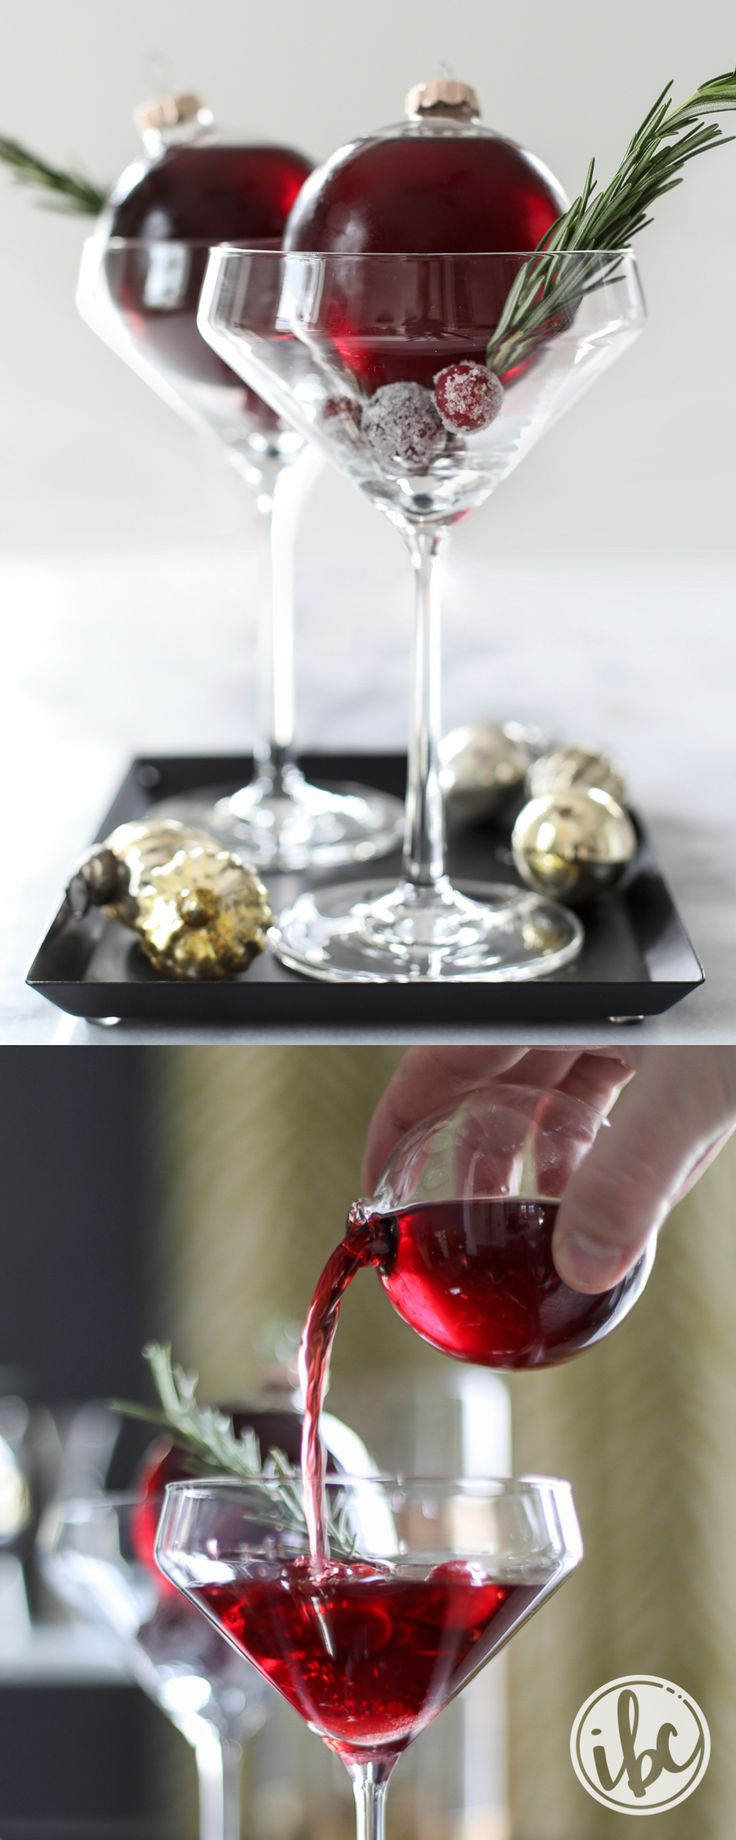 Very Merry Christmas Cocktail Martini recipe #signaturecocktail